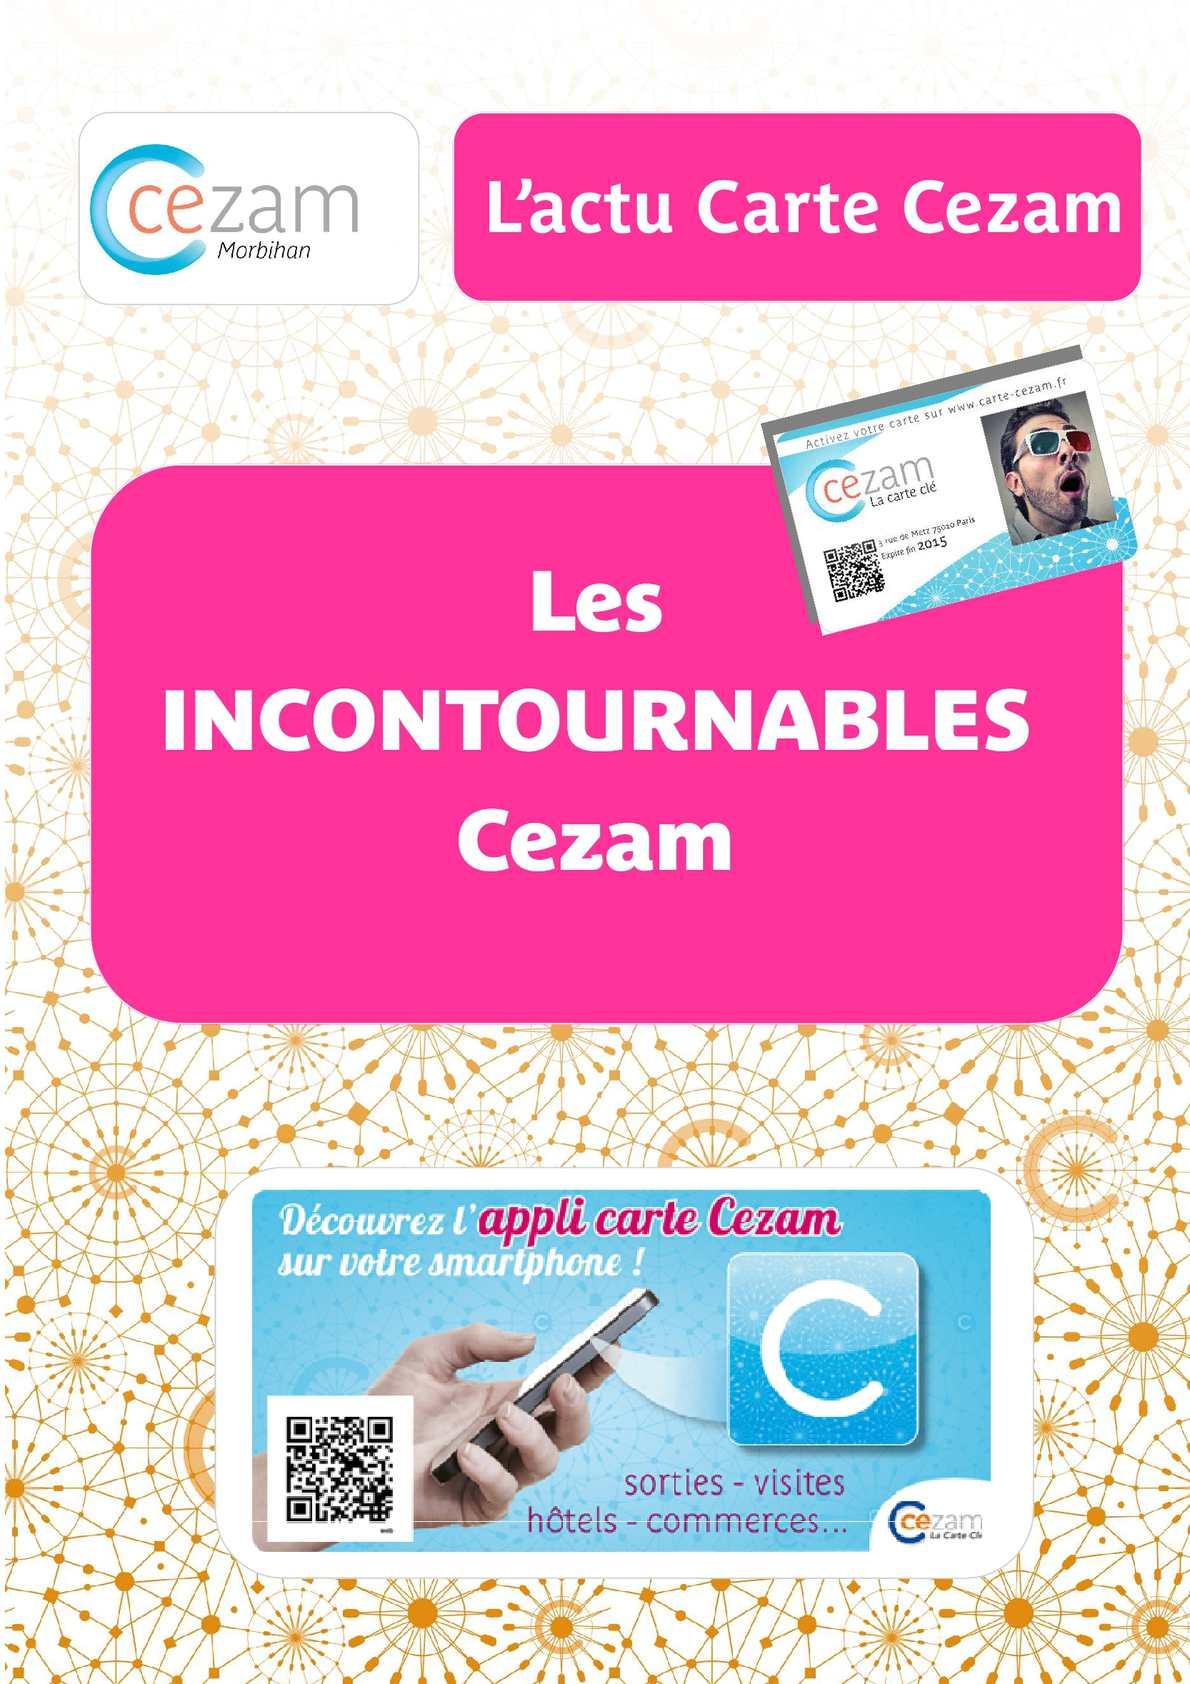 Carte Cezam Niort.Calameo Livret Salaries Cezam 56 X 16